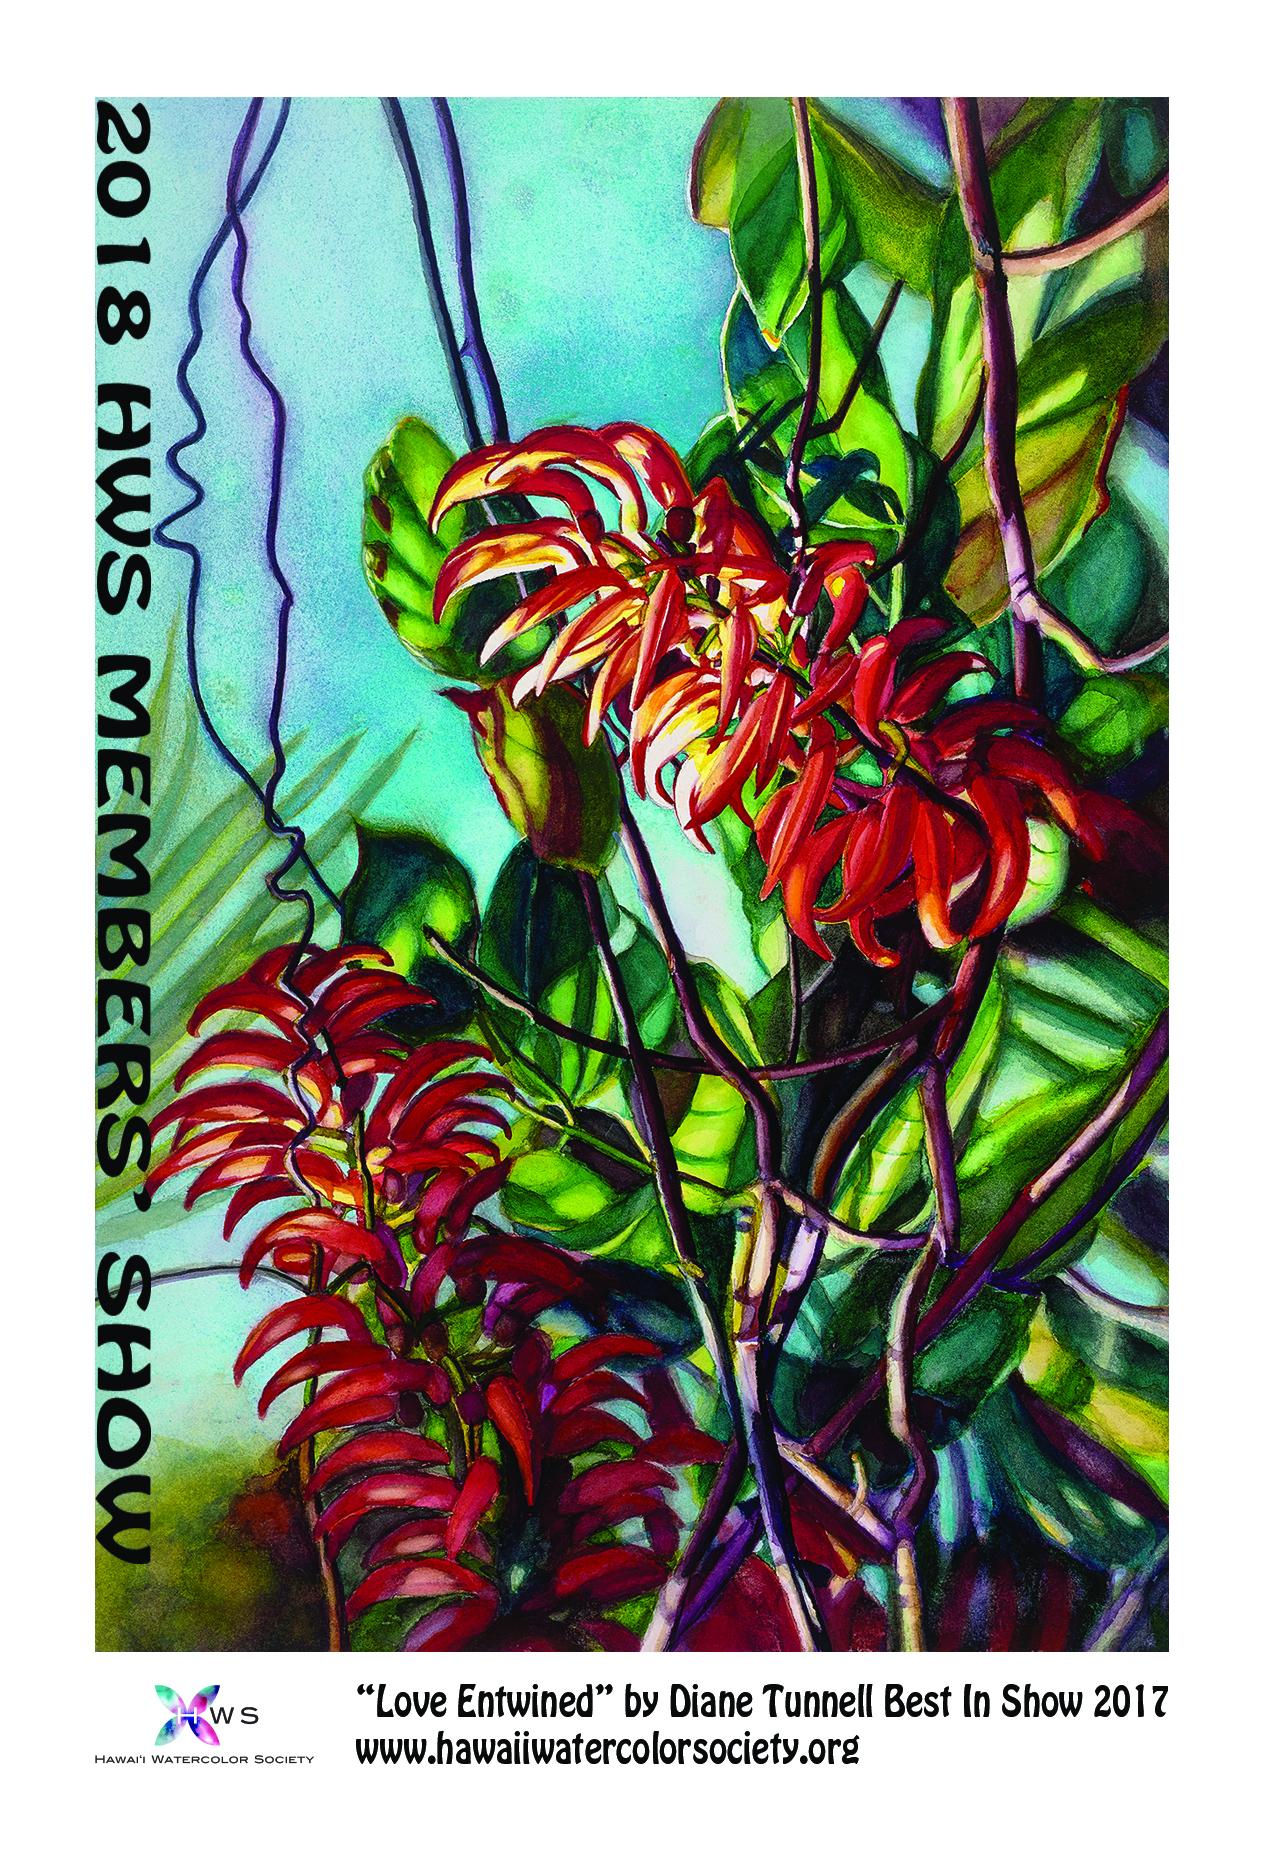 hawaii-watercolor-societys-annual-members-show--arts-at-marks-garage-april-3-28-2018-3.jpg